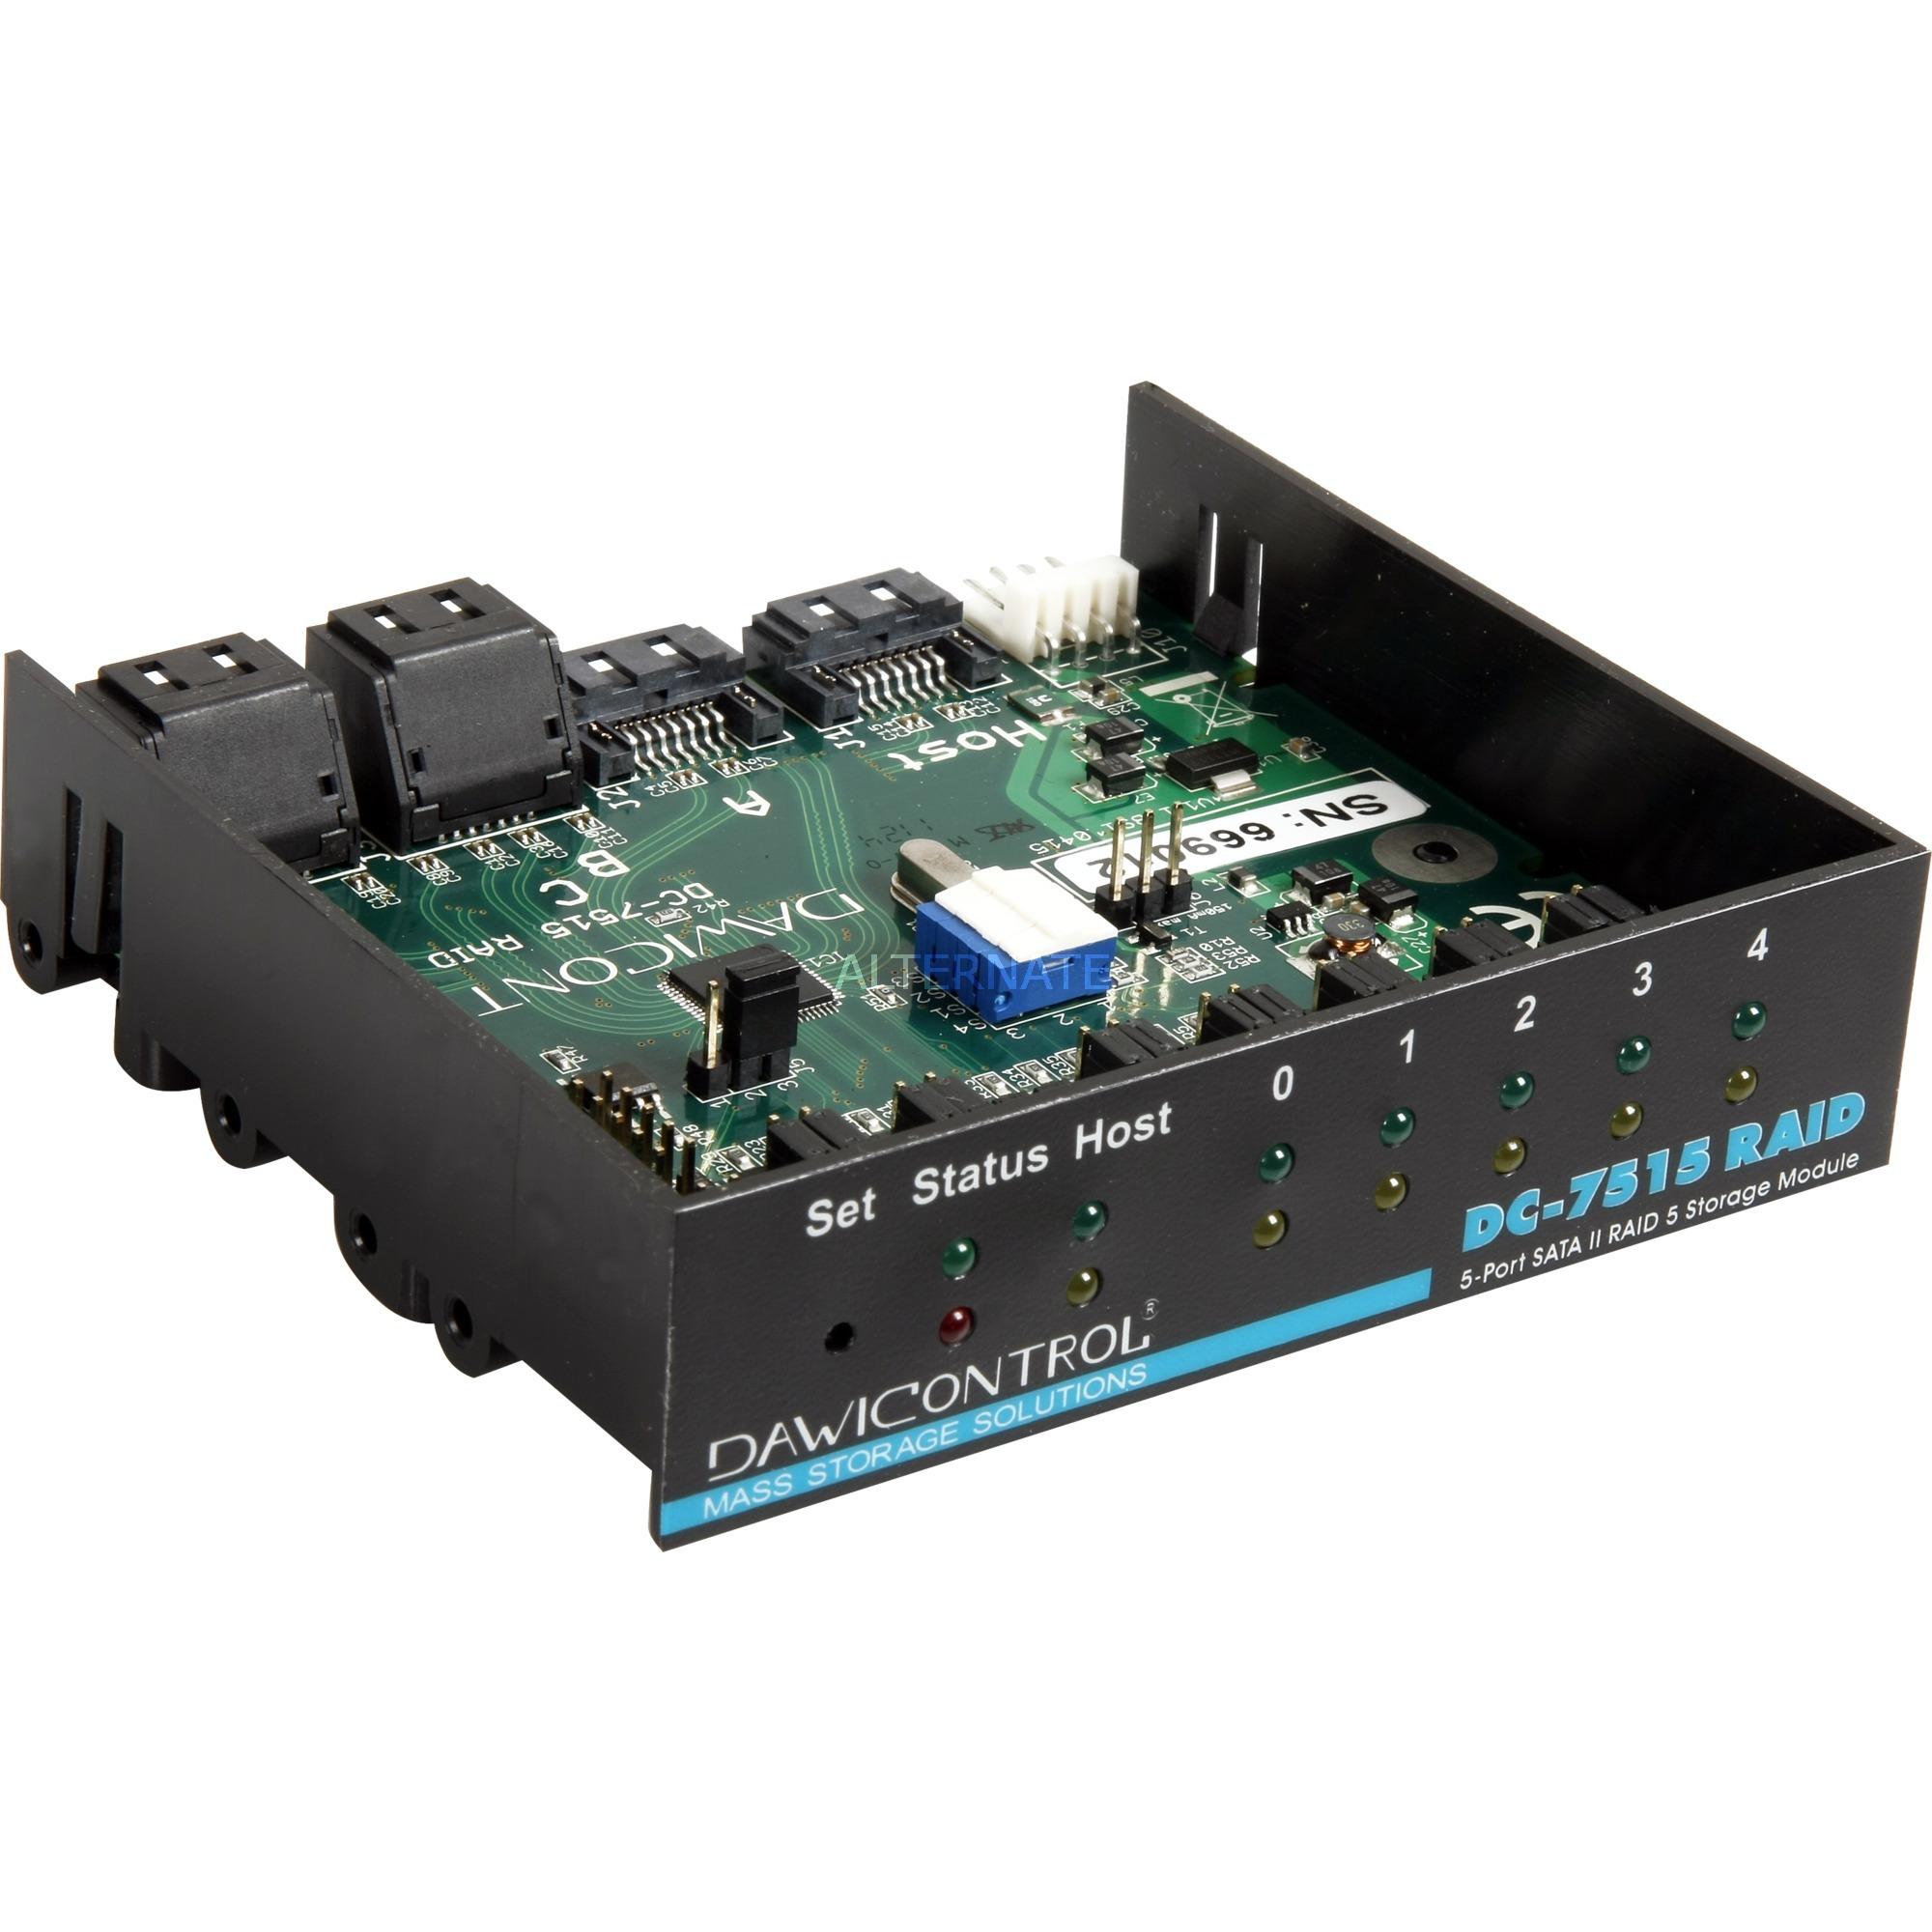 DC-7515 RAID 3Gbit/s contrôleur RAID